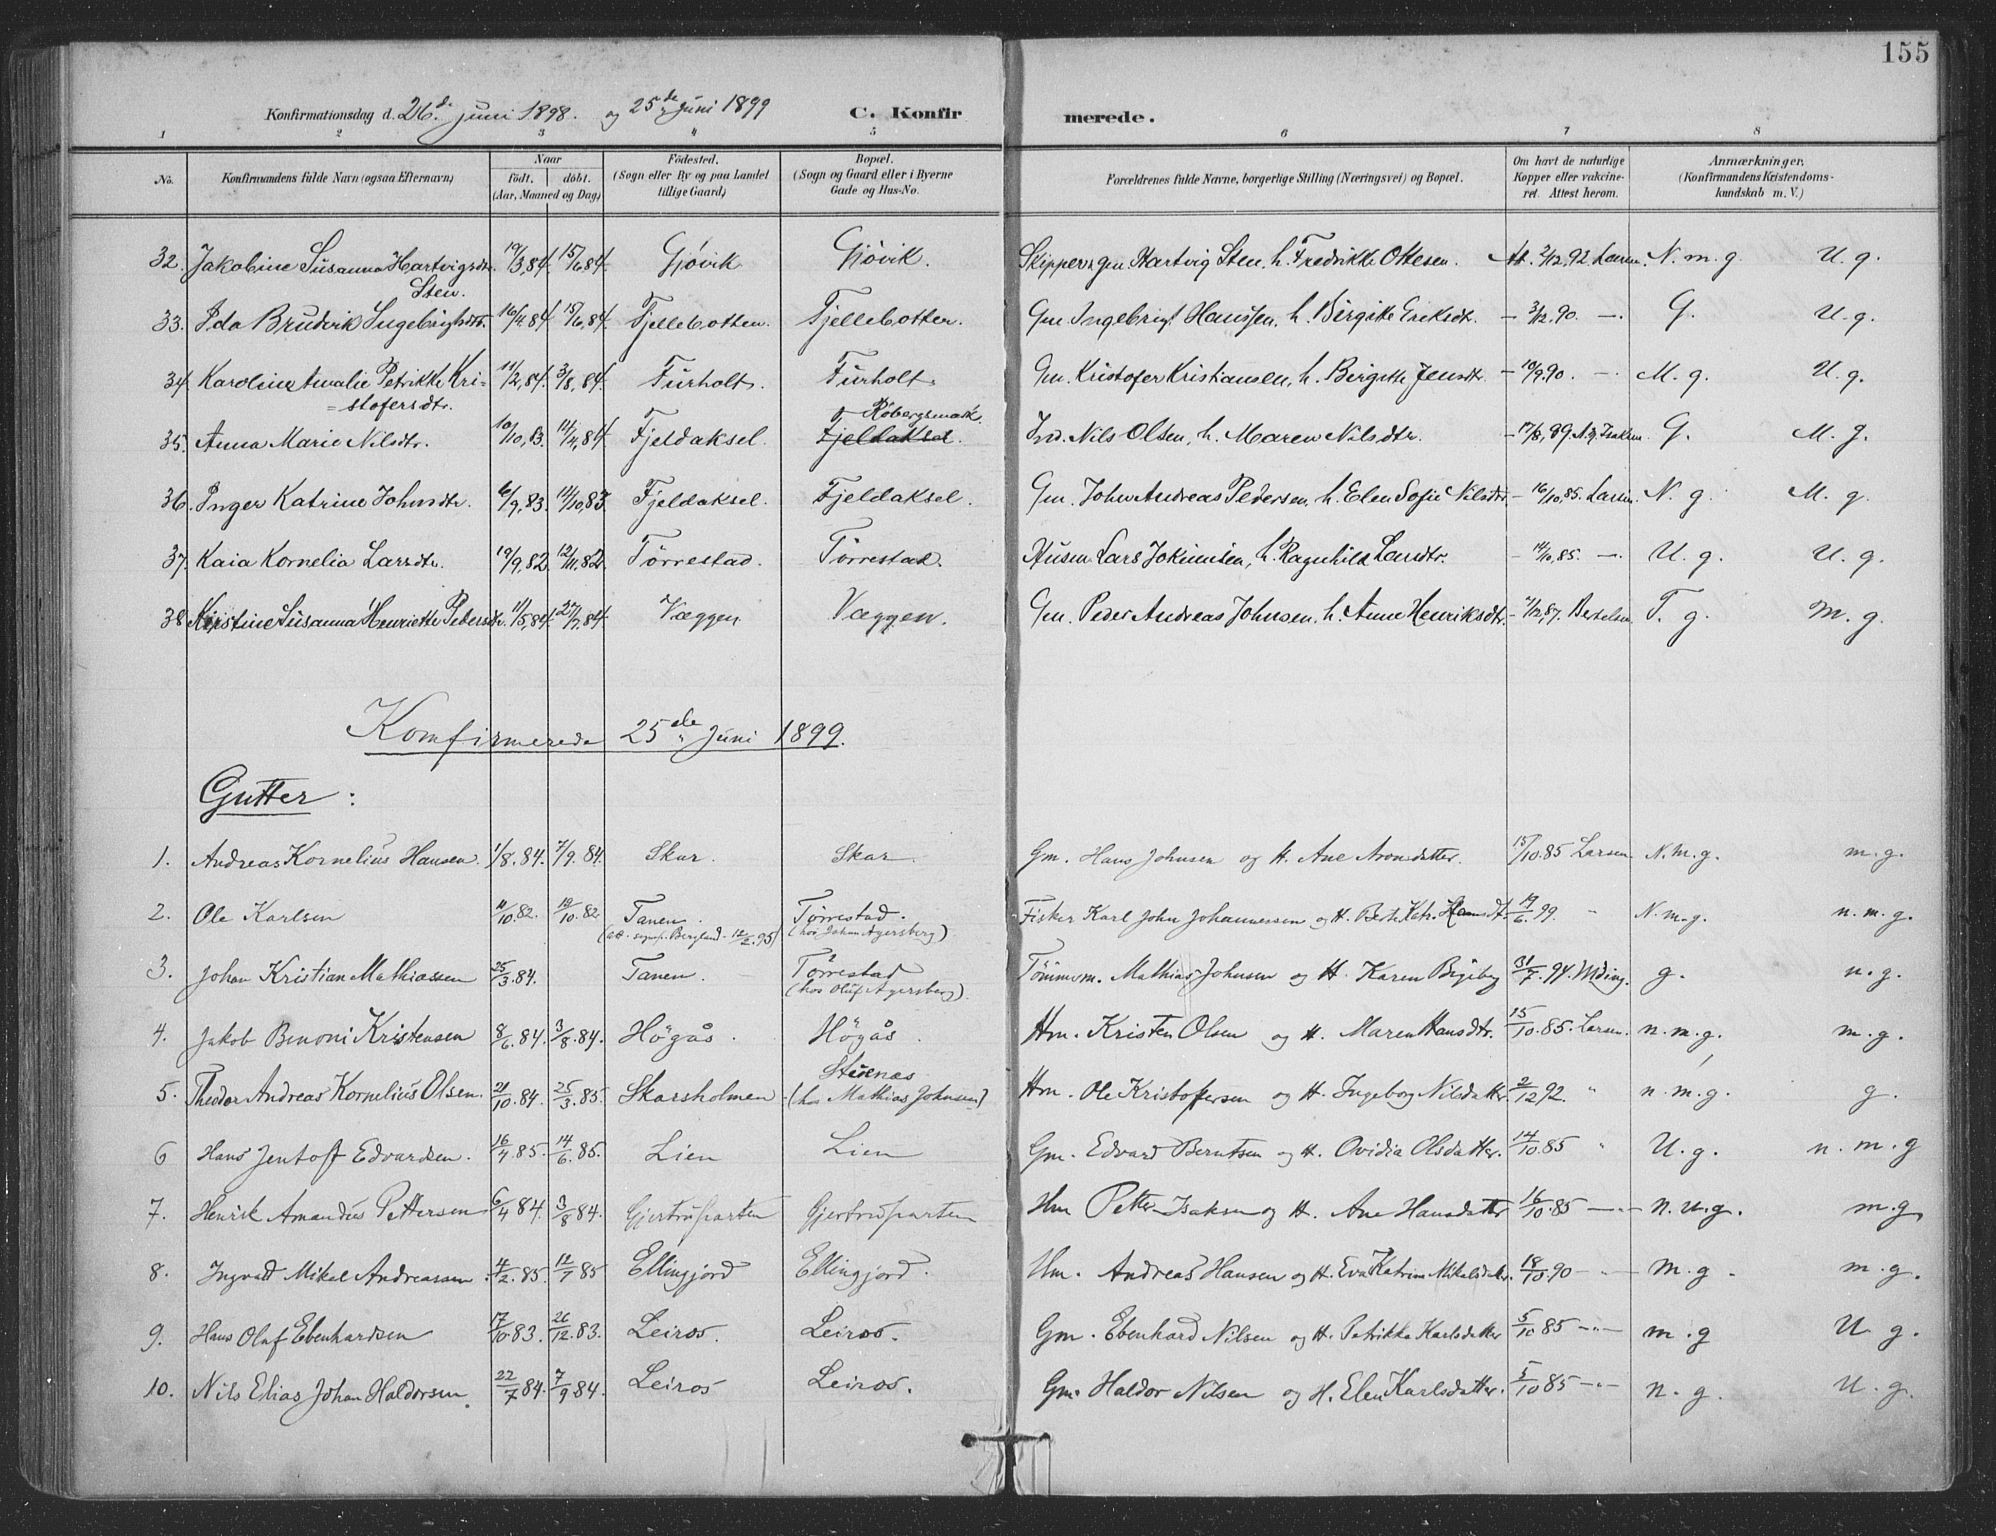 SAT, Ministerialprotokoller, klokkerbøker og fødselsregistre - Nordland, 863/L0899: Ministerialbok nr. 863A11, 1897-1906, s. 155